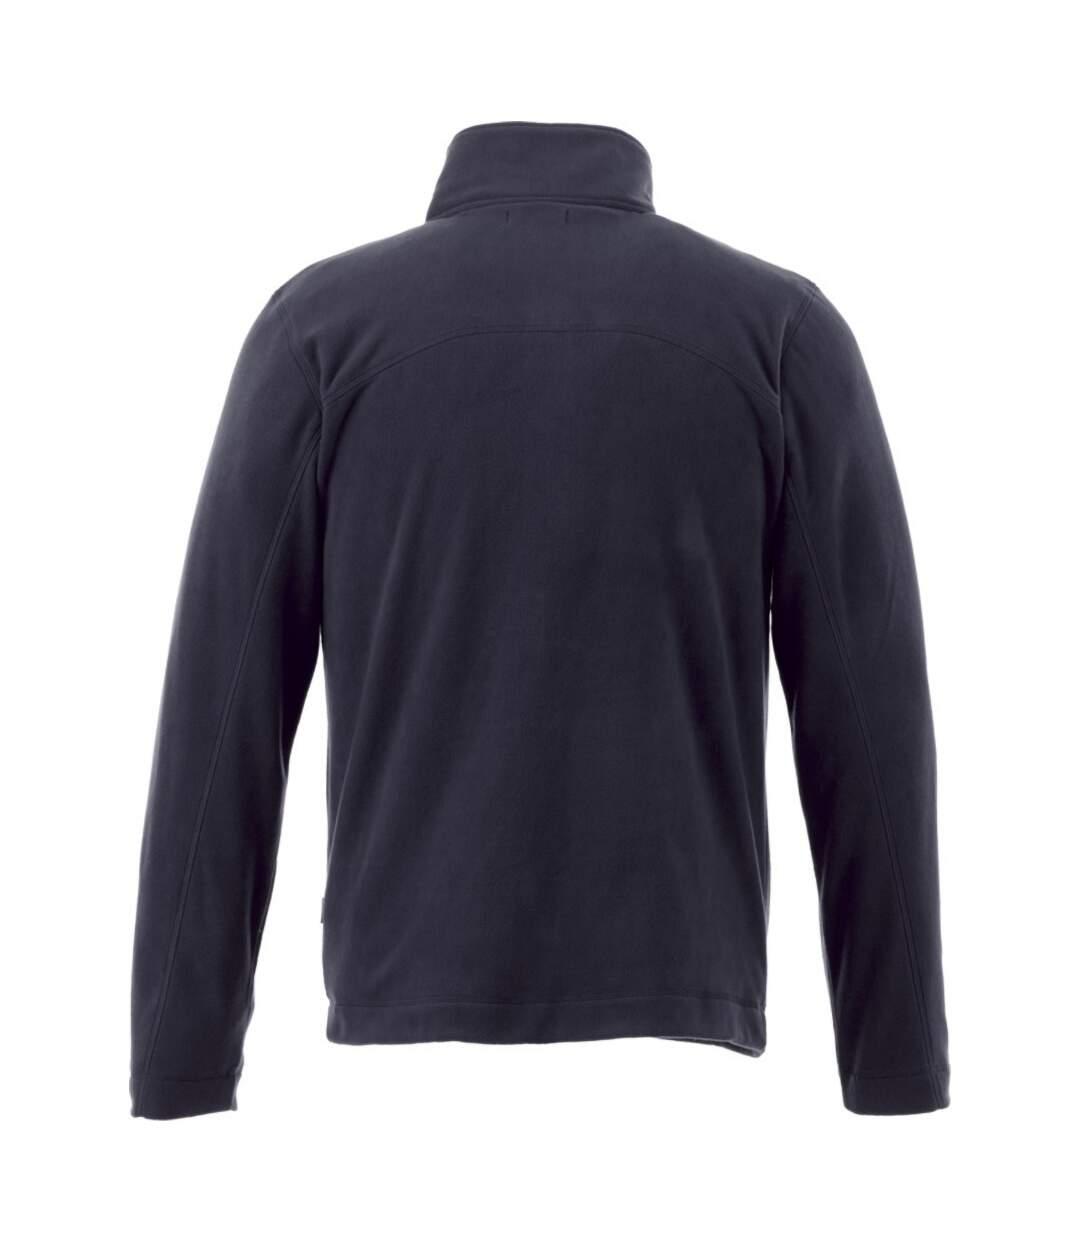 Slazenger Mens Pitch Microfleece Jacket (Grey) - UTPF1797